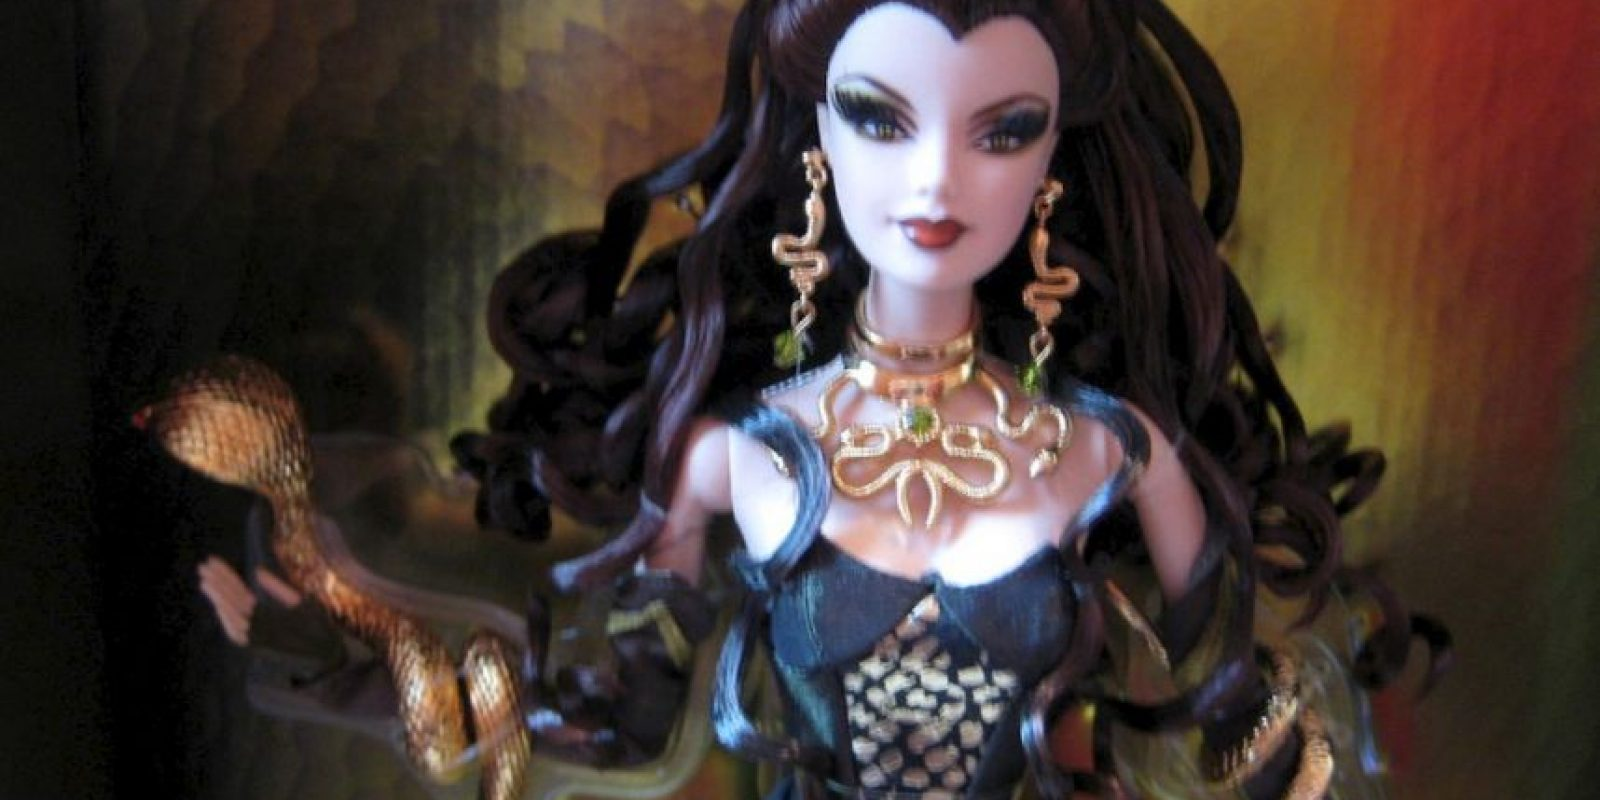 La Barbie Medusa. Foto:Mattel